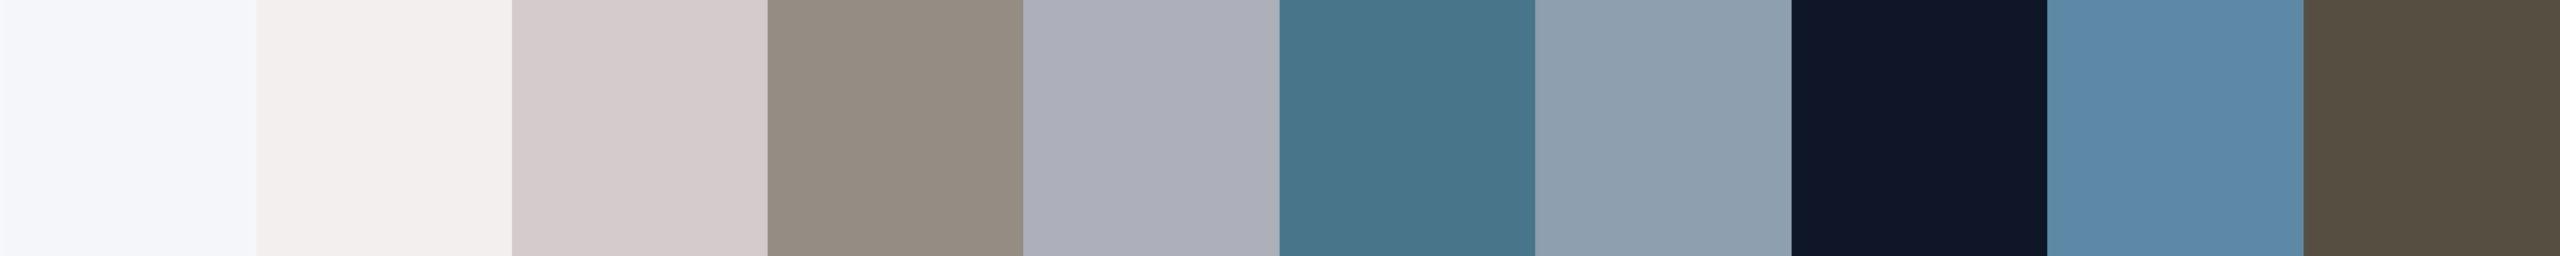 3 Chronia Color Palette